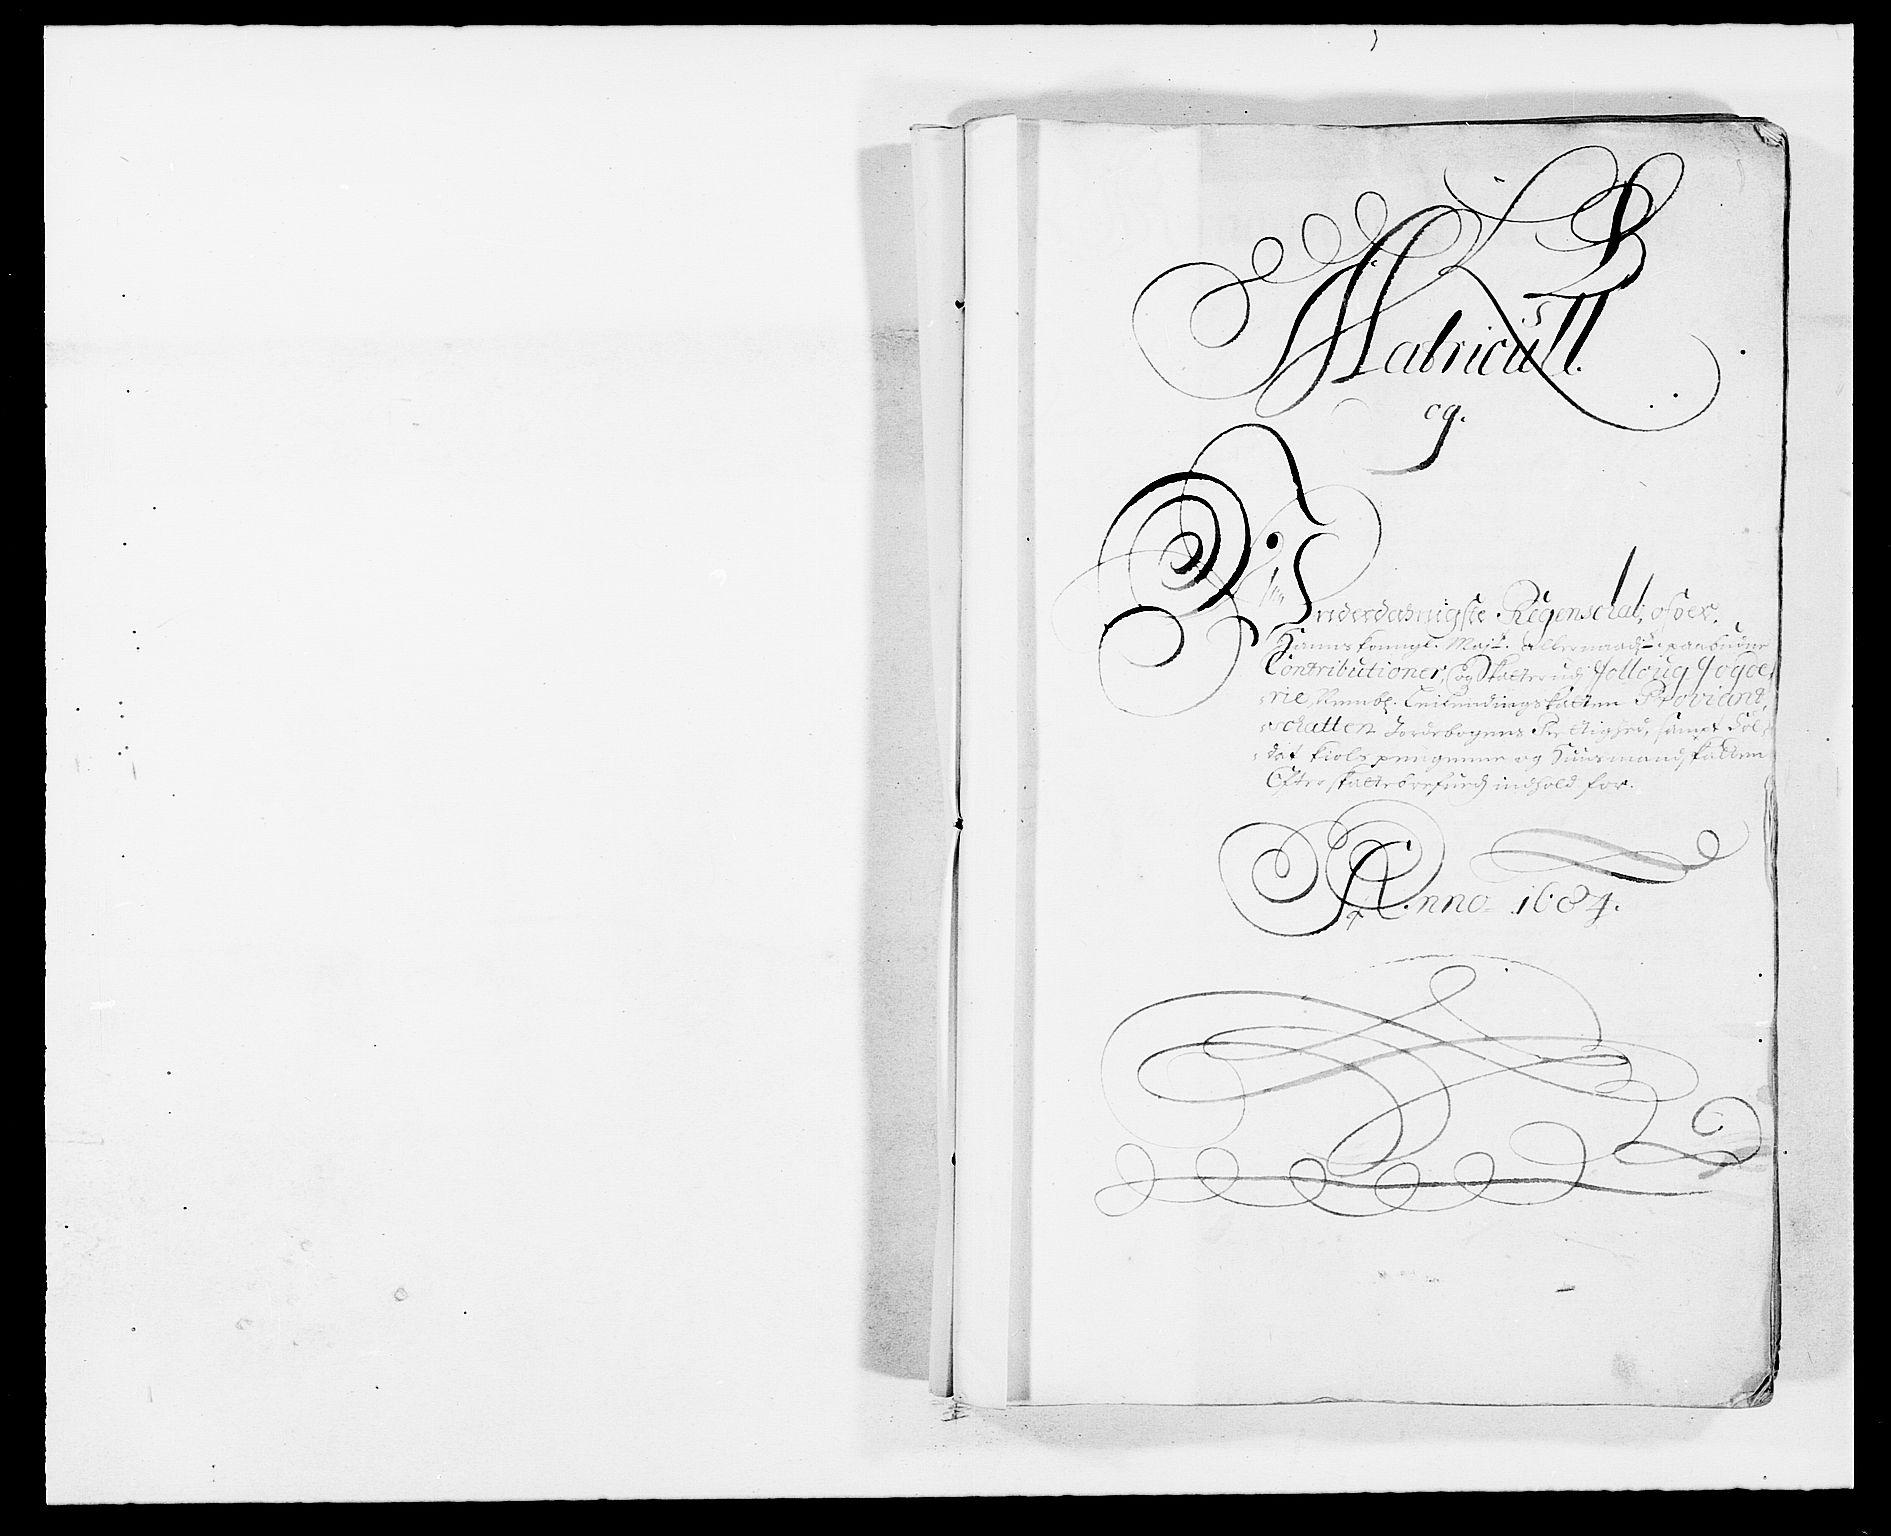 RA, Rentekammeret inntil 1814, Reviderte regnskaper, Fogderegnskap, R09/L0431: Fogderegnskap Follo, 1684, s. 5